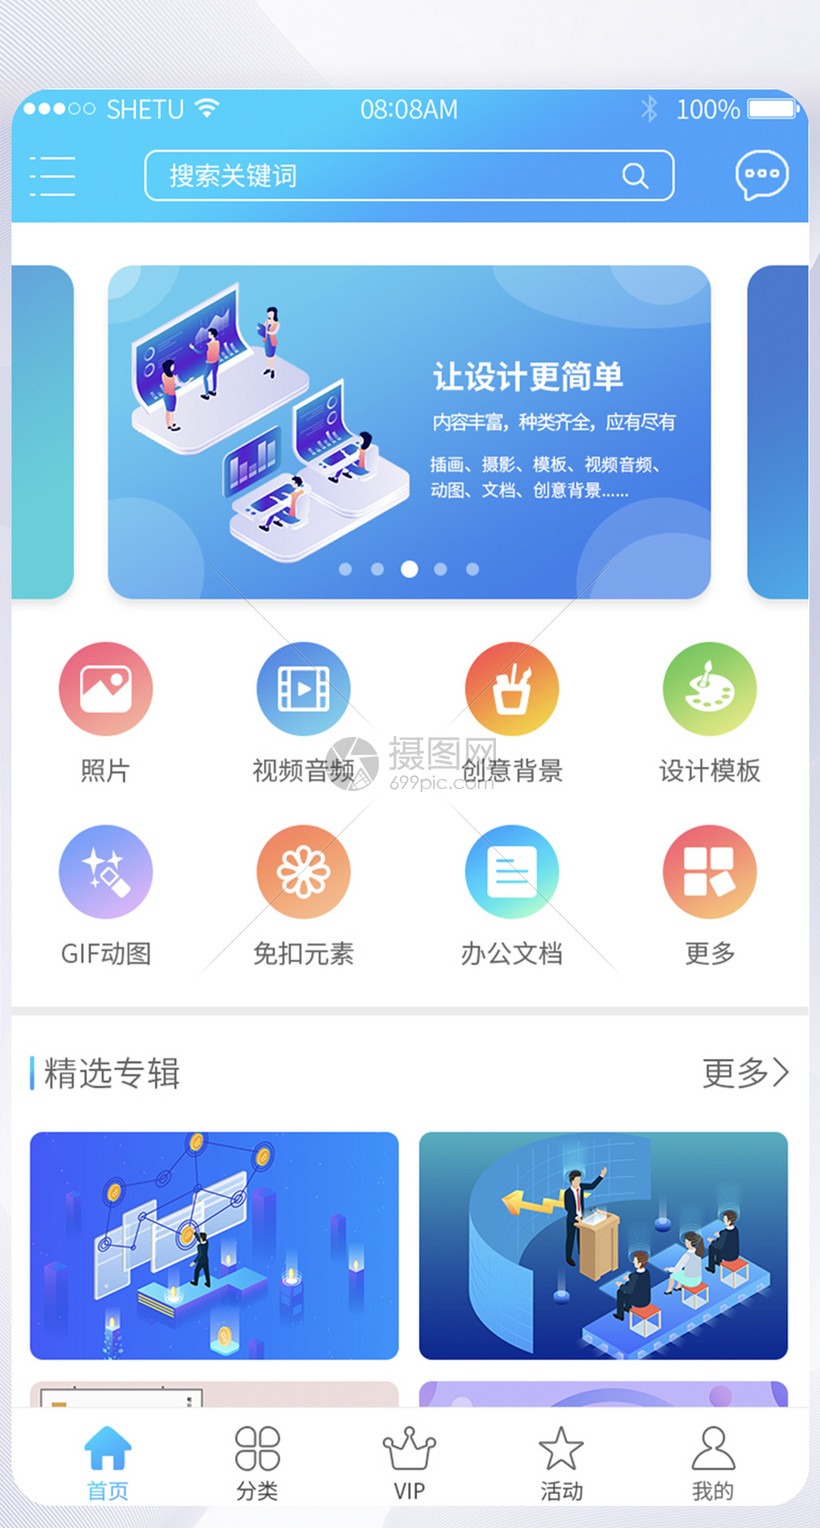 UI设计家具渐设计app图标面图片素材_免费下蓝色品牌主页变色图片